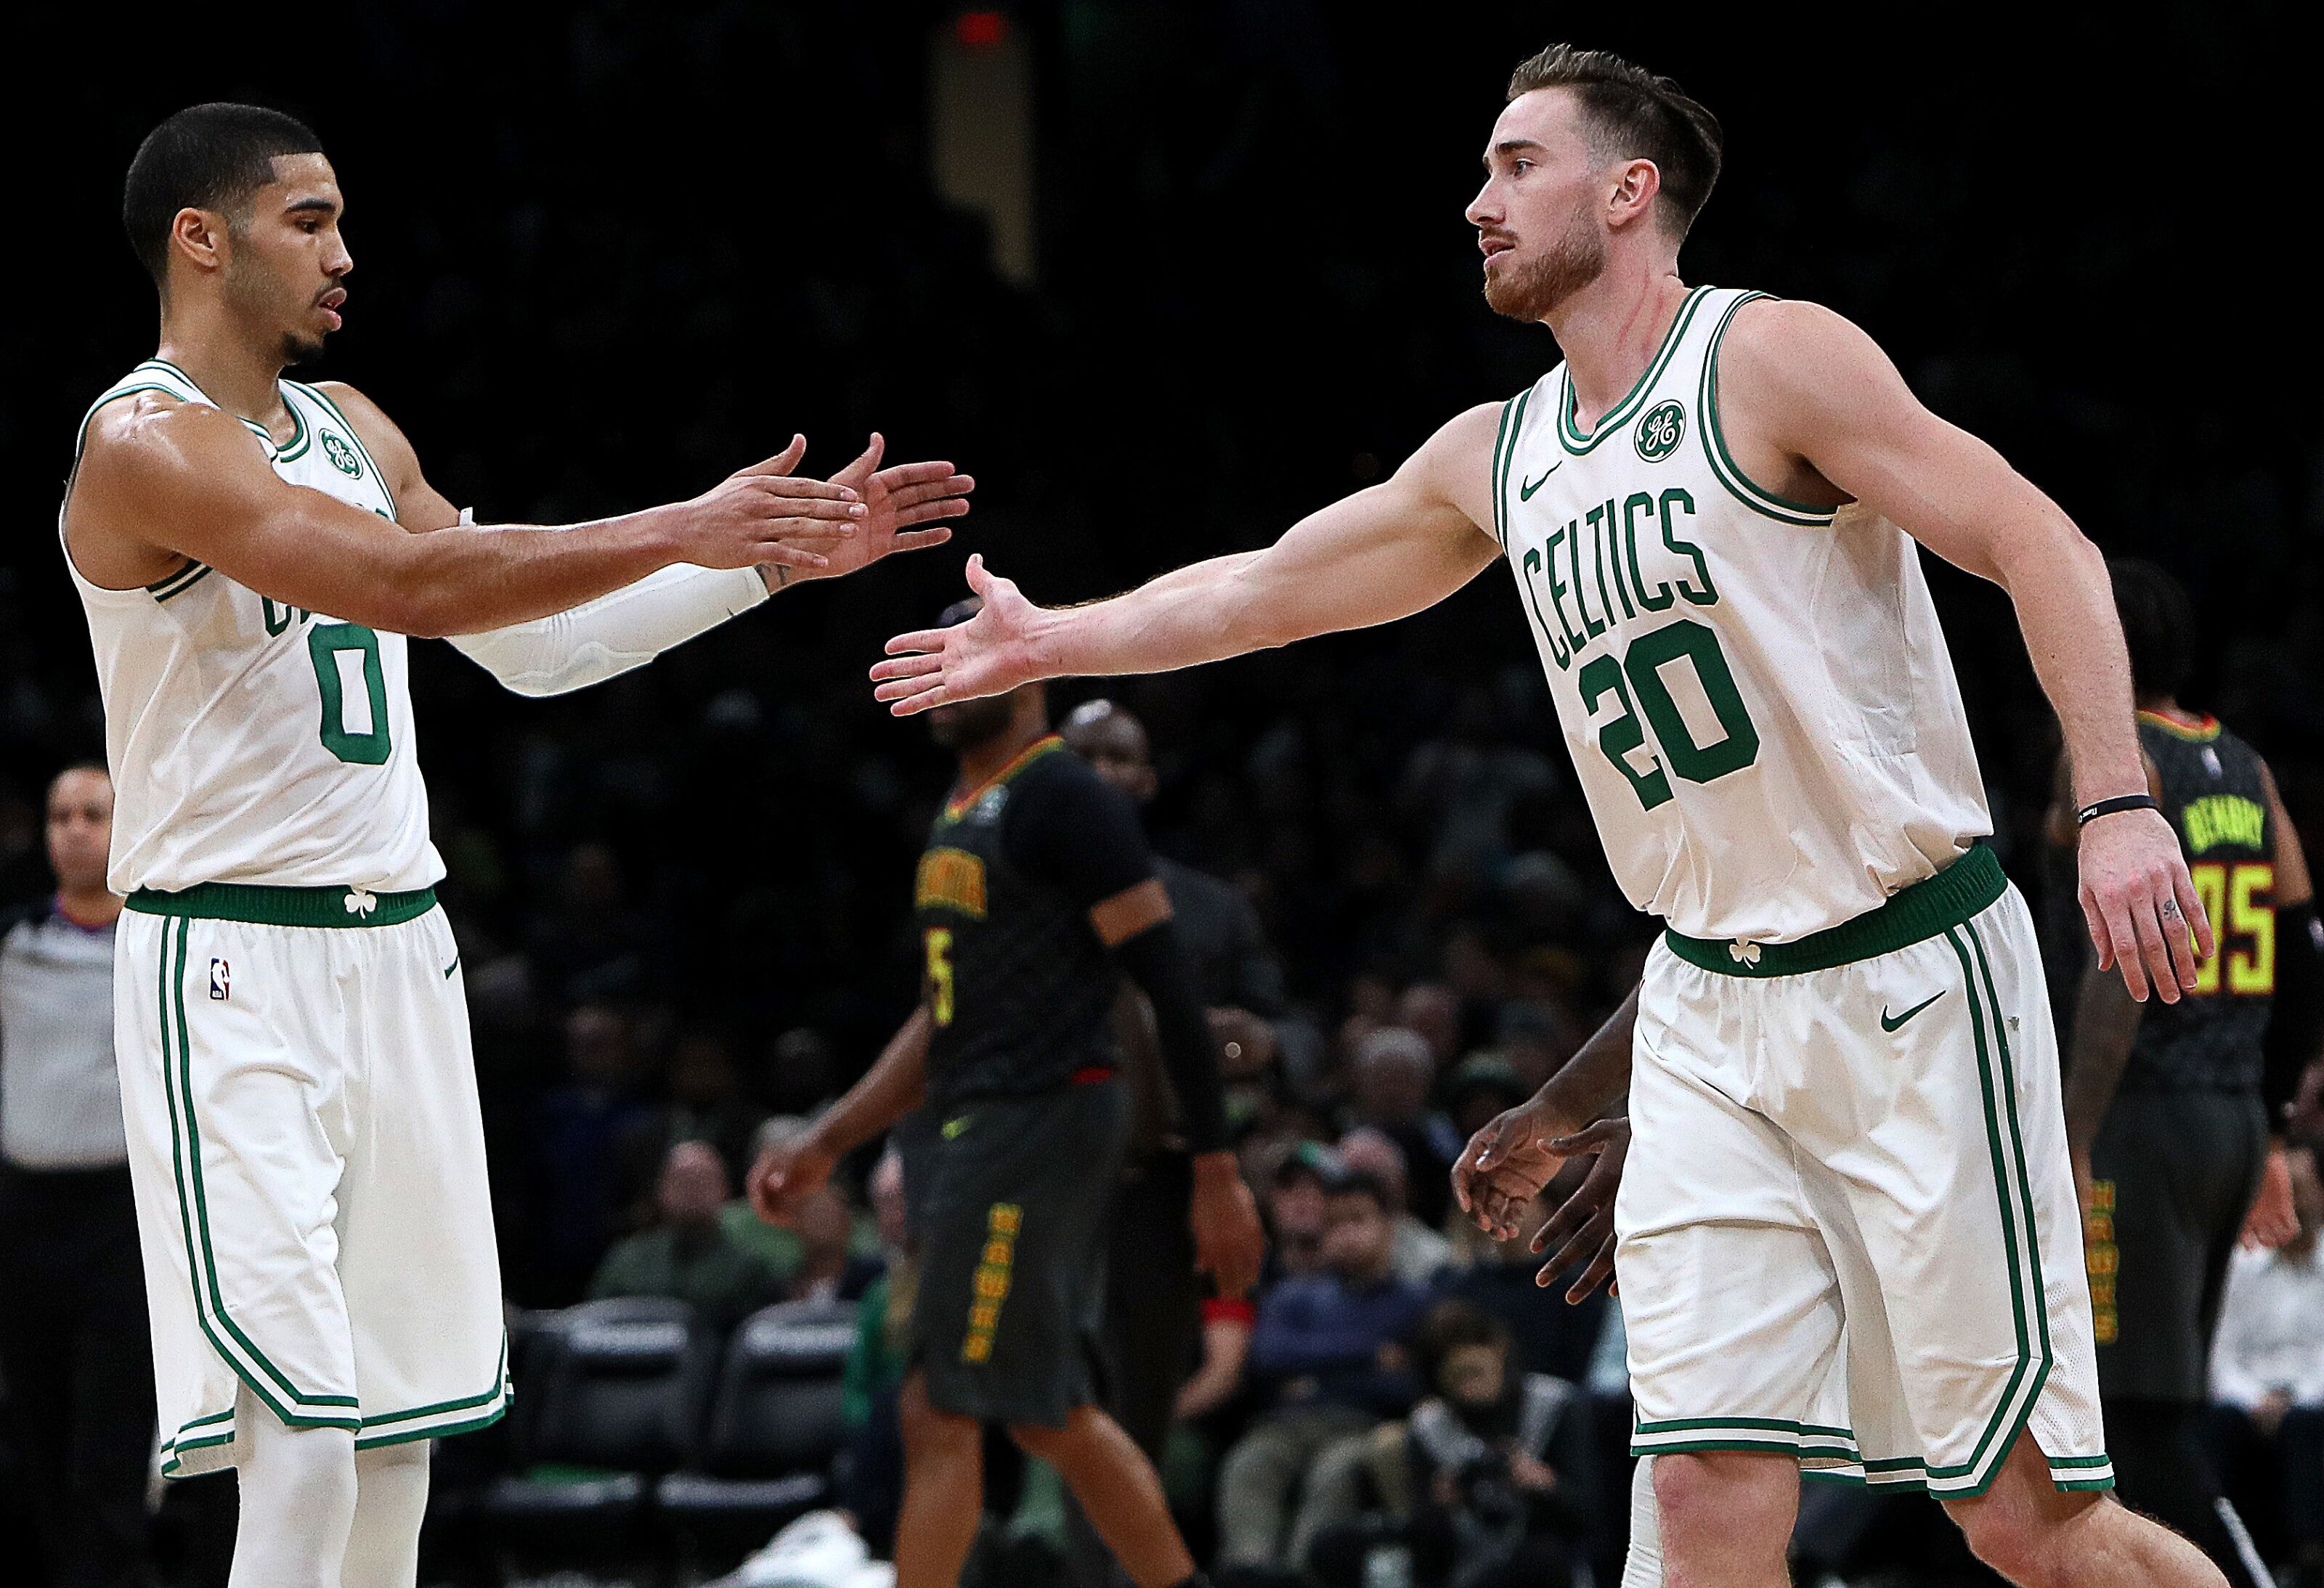 Boston Celtics: Why a healthy Hayward may hinder development